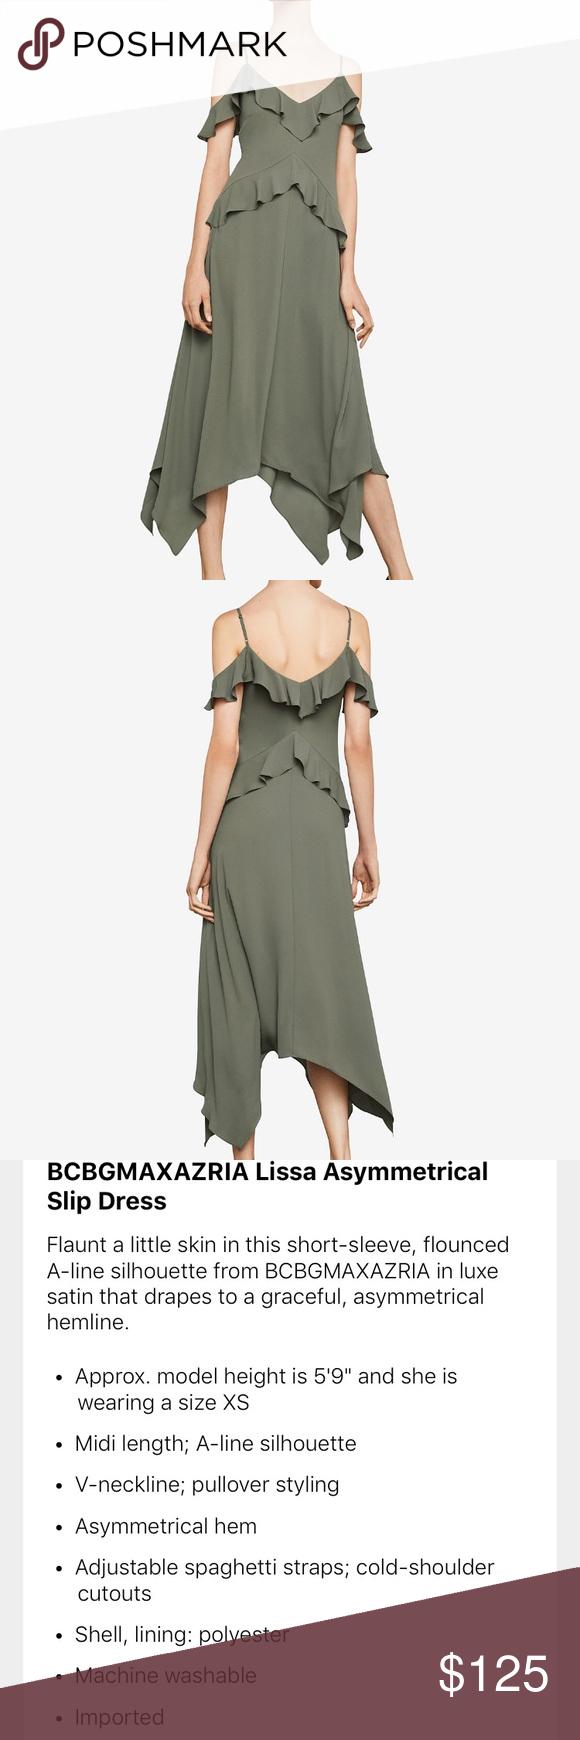 0c5037b7e3ec BCBGMaxazria NWT Asymmetrical Lissa XS Slip Dres Gorgeous green extra small  asymmetrical cold shoulder flutter dress